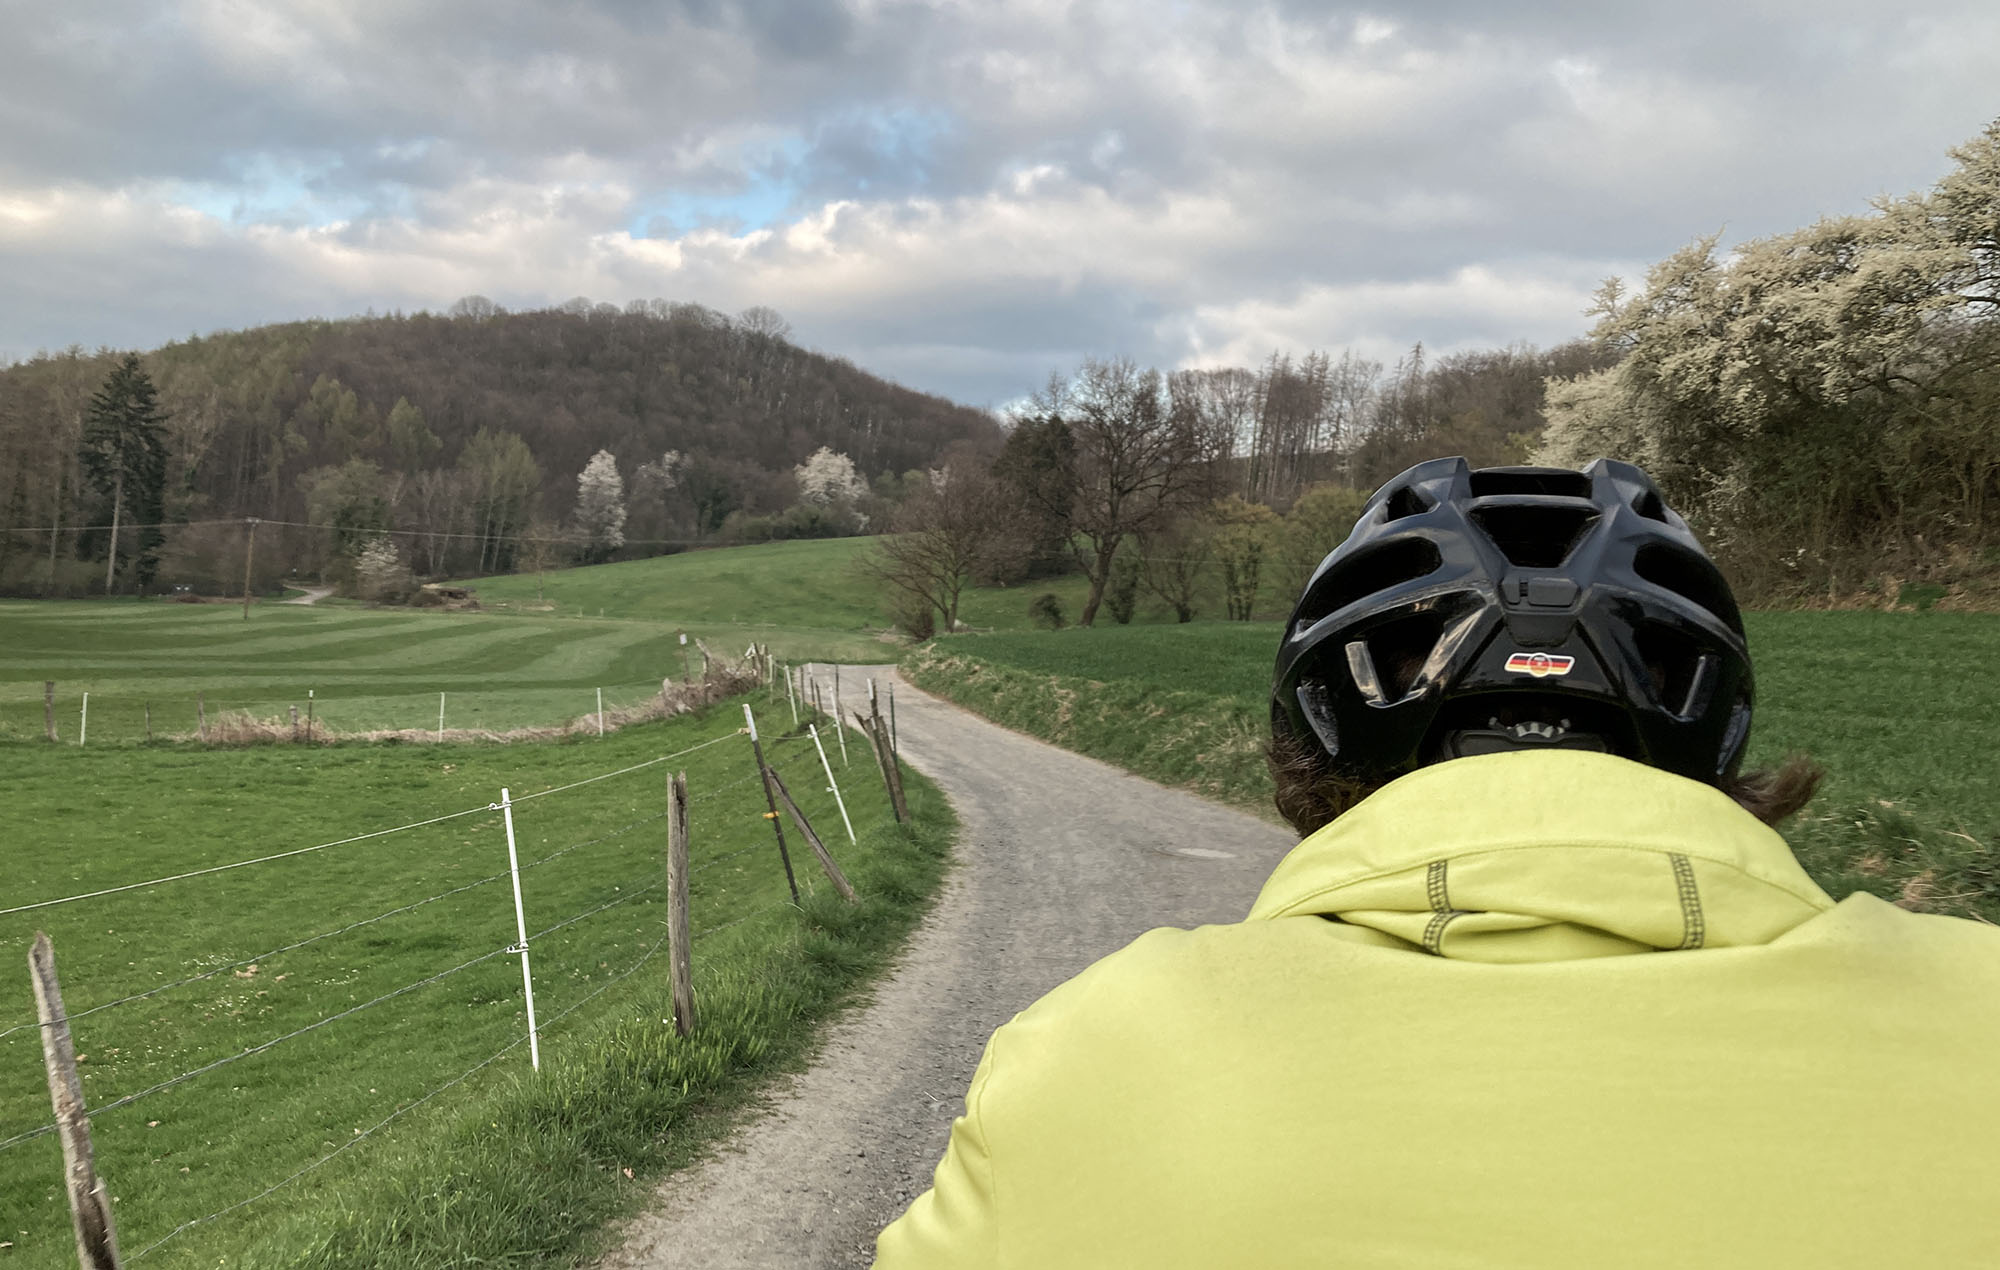 Siebengebirge_Lauterbachtal_Bikefolks